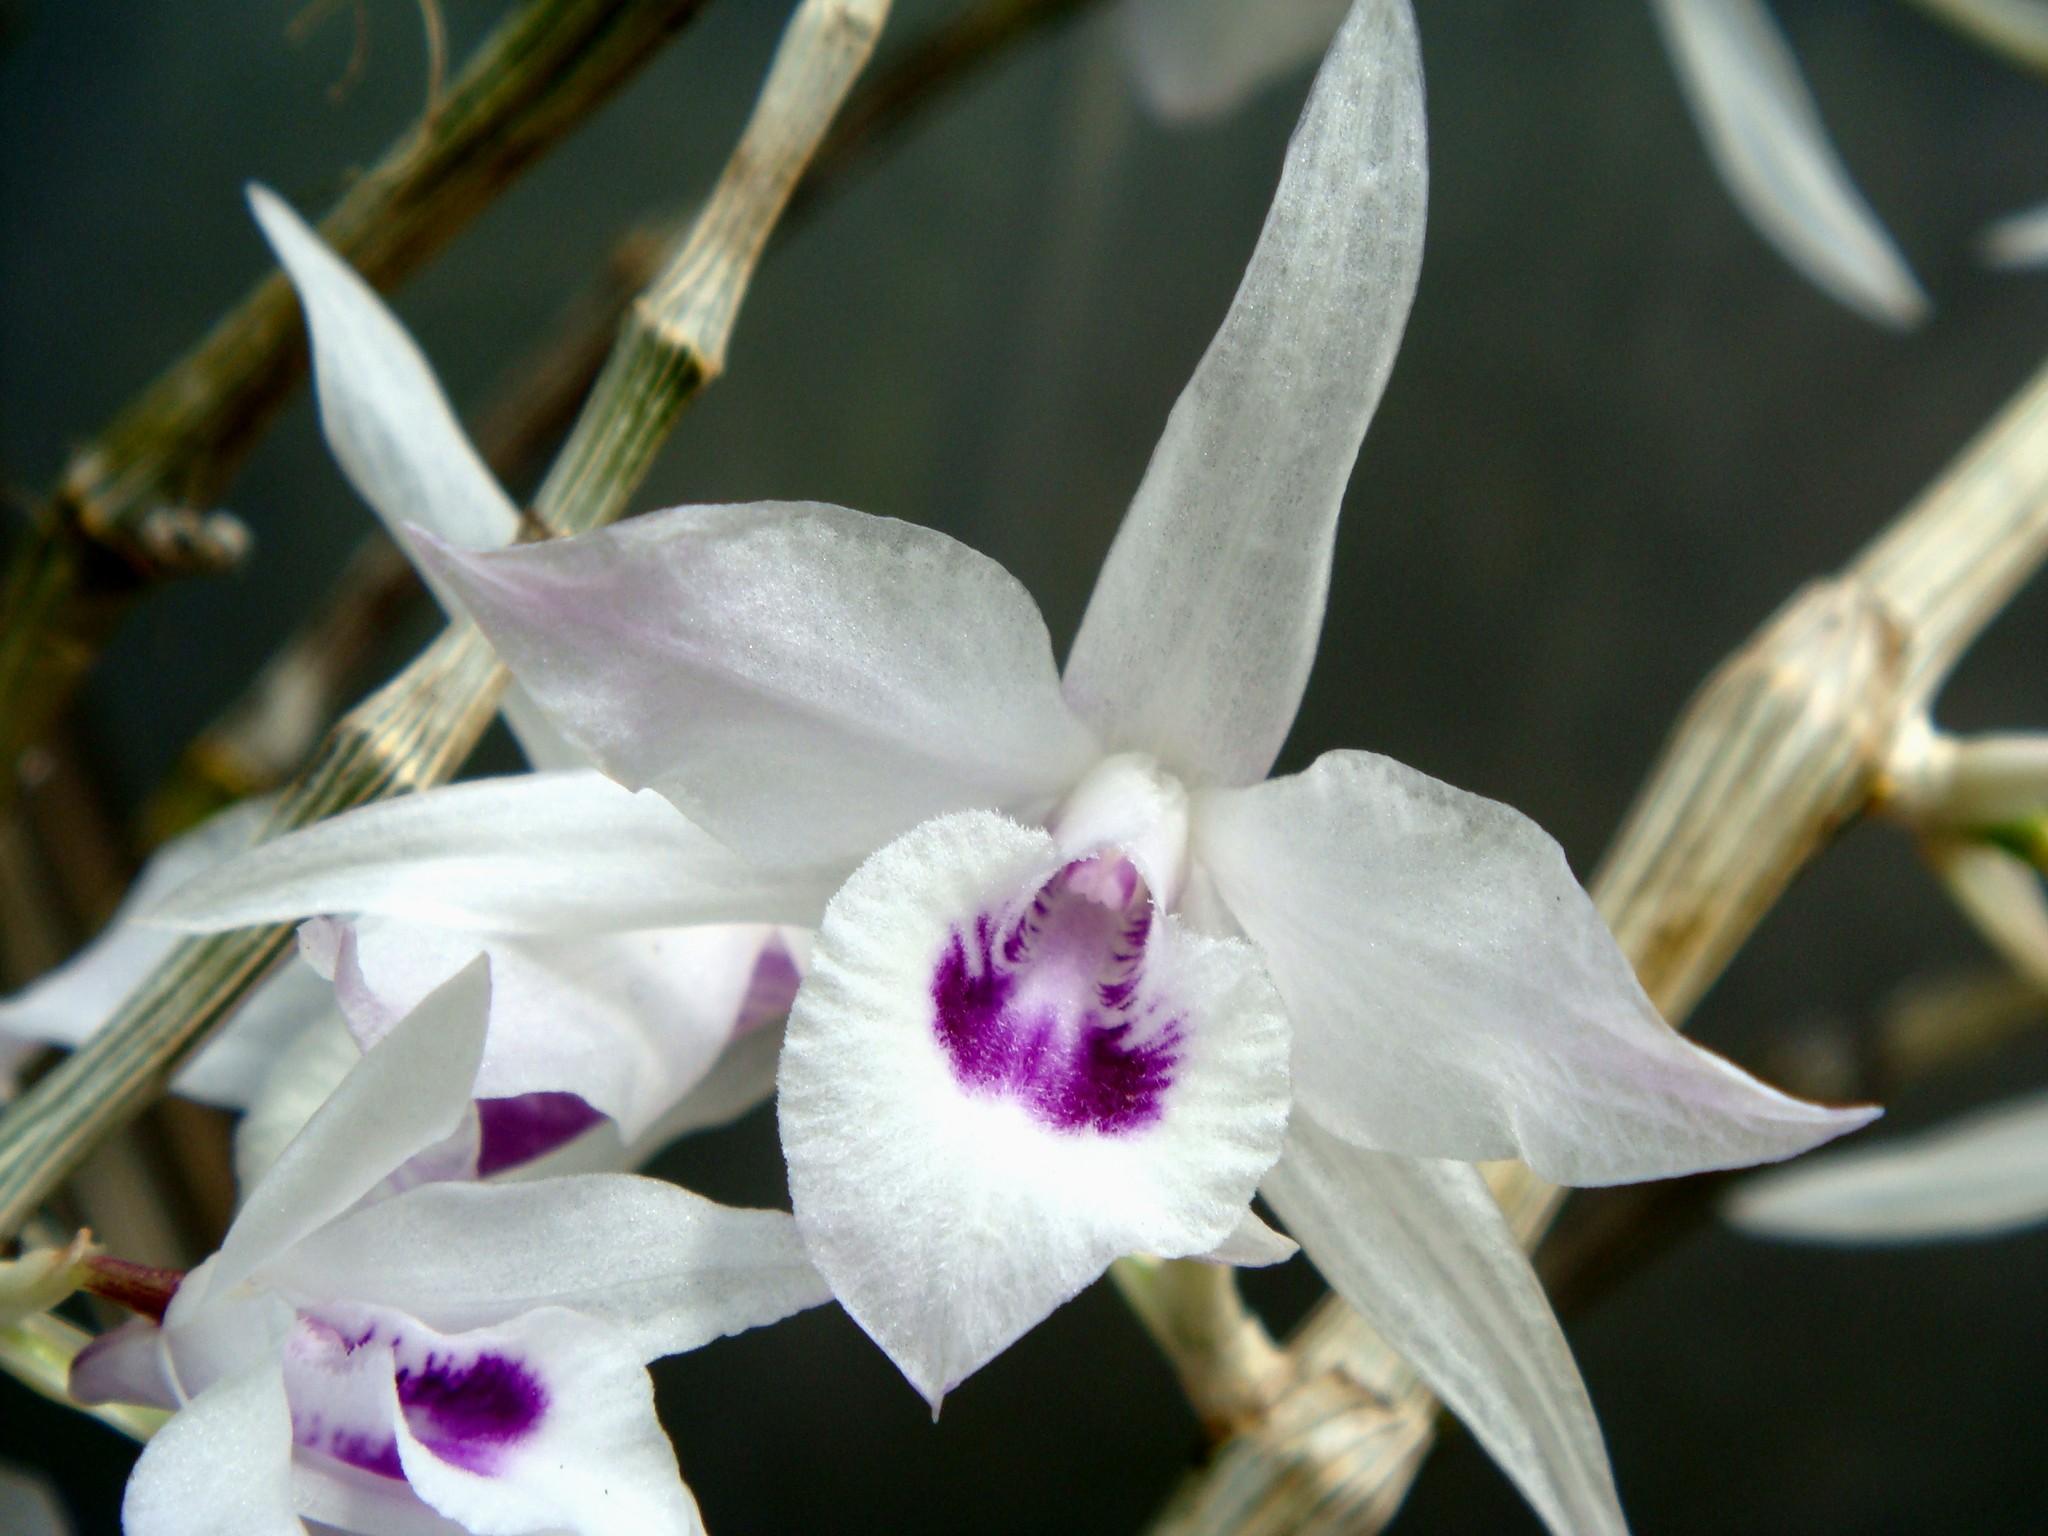 http://orchids.la.coocan.jp/Dendrobium/Dendrobium%20transparens/DSC04761.JPG